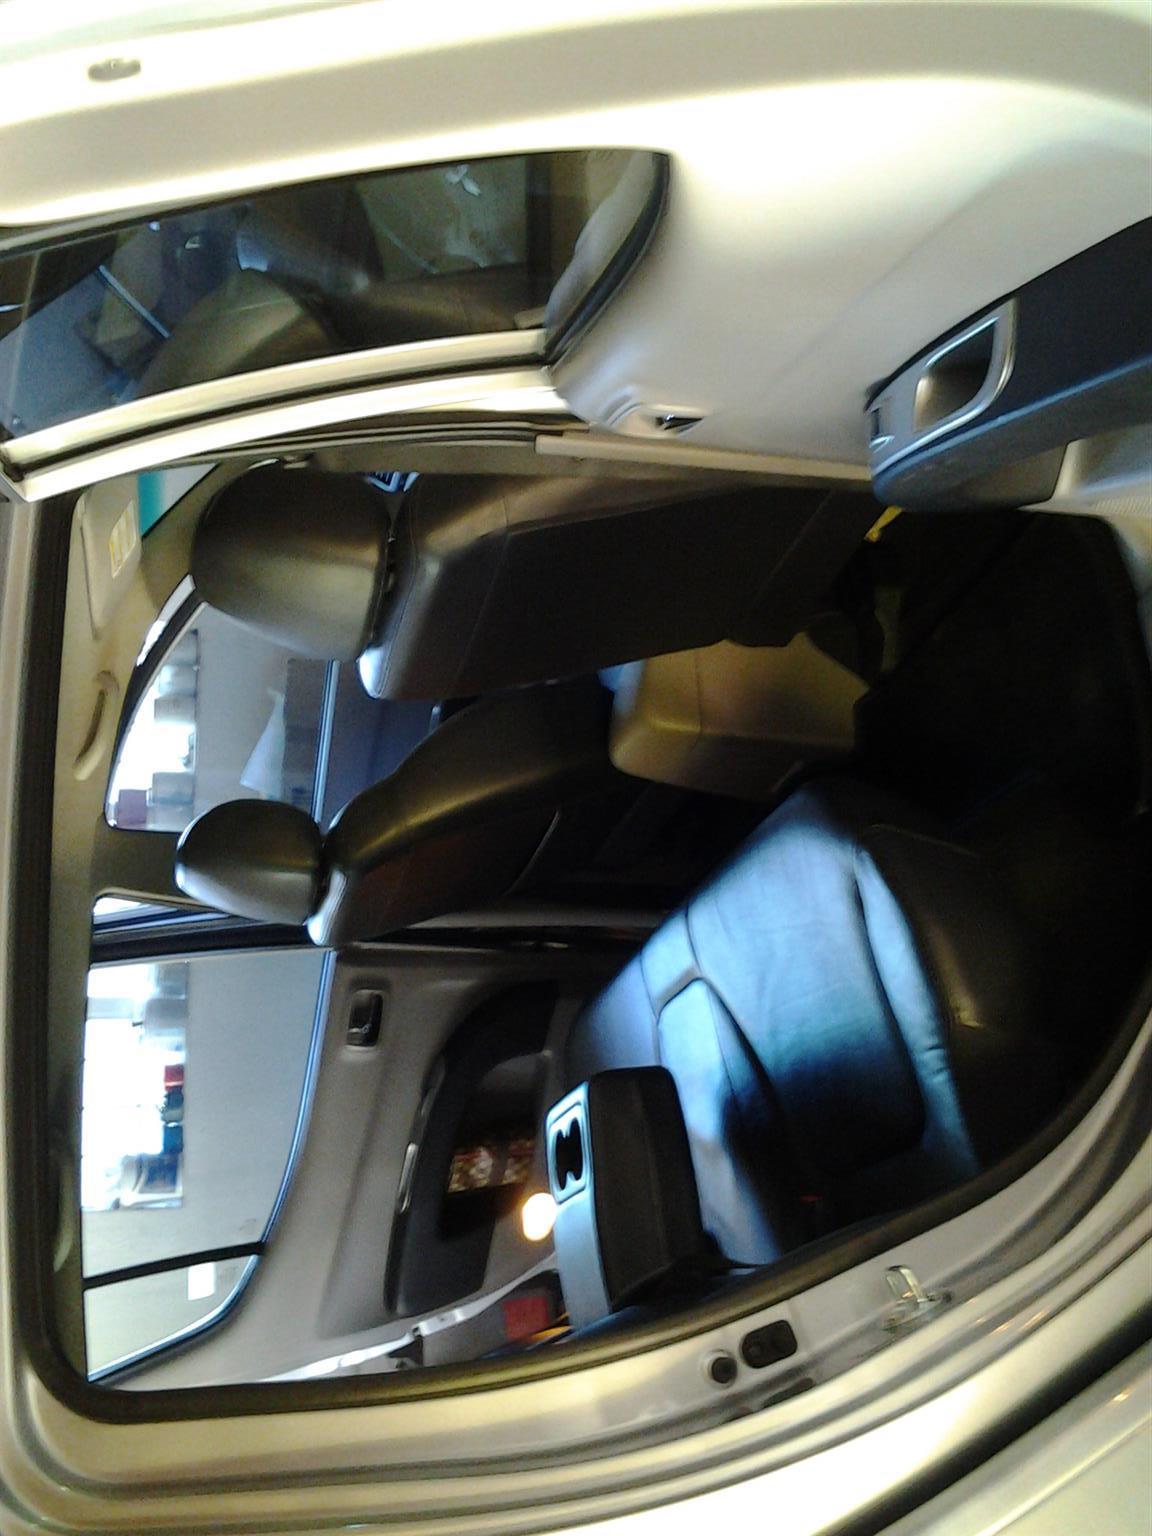 2011 Mitsubishi Triton Double Cab